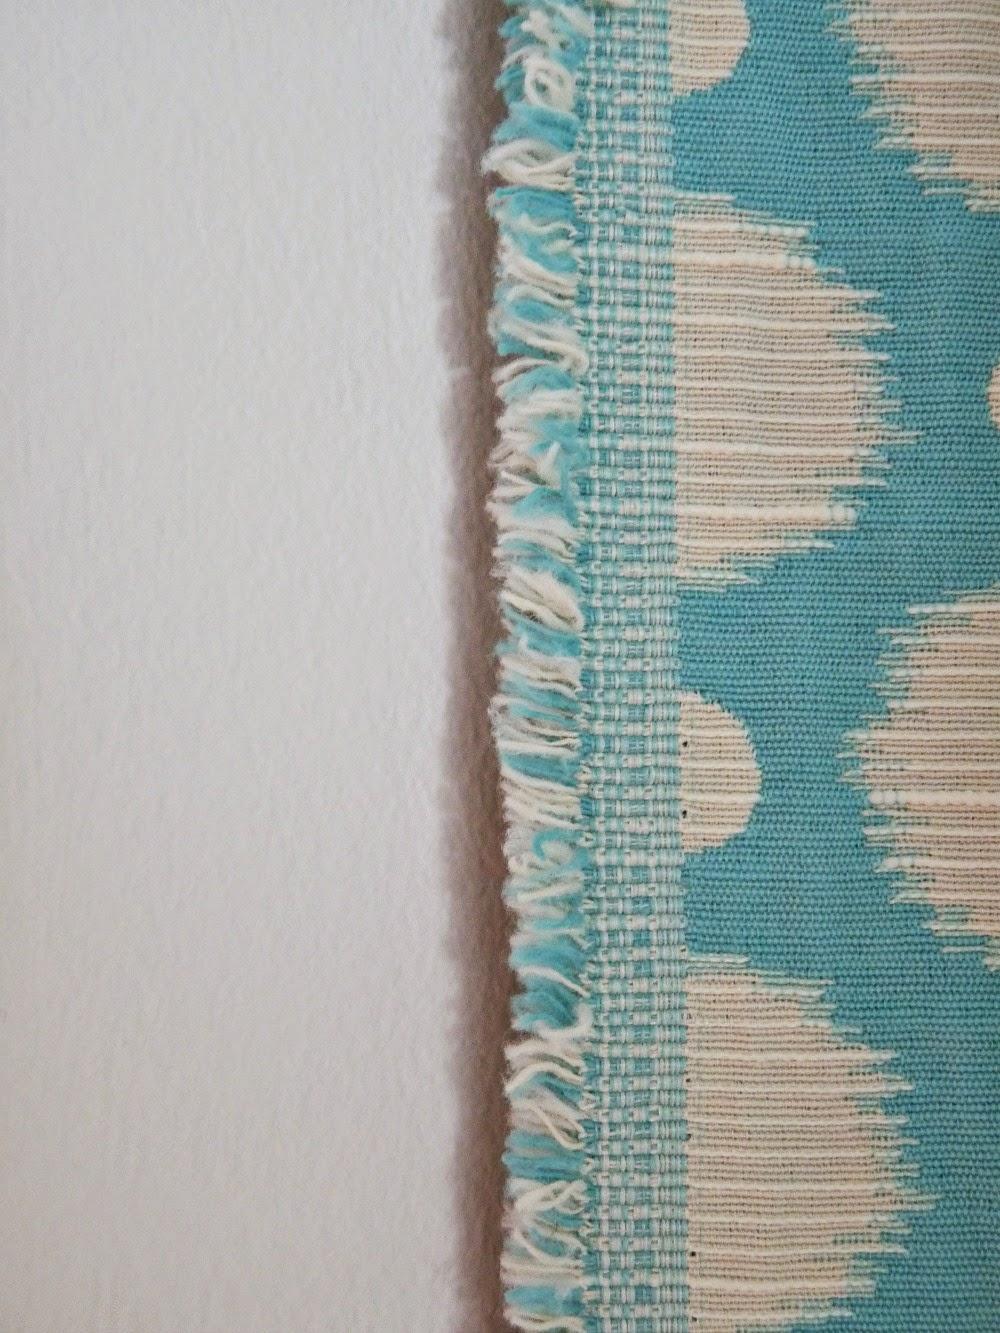 Aqua polka dot upholstery and drapery fabric